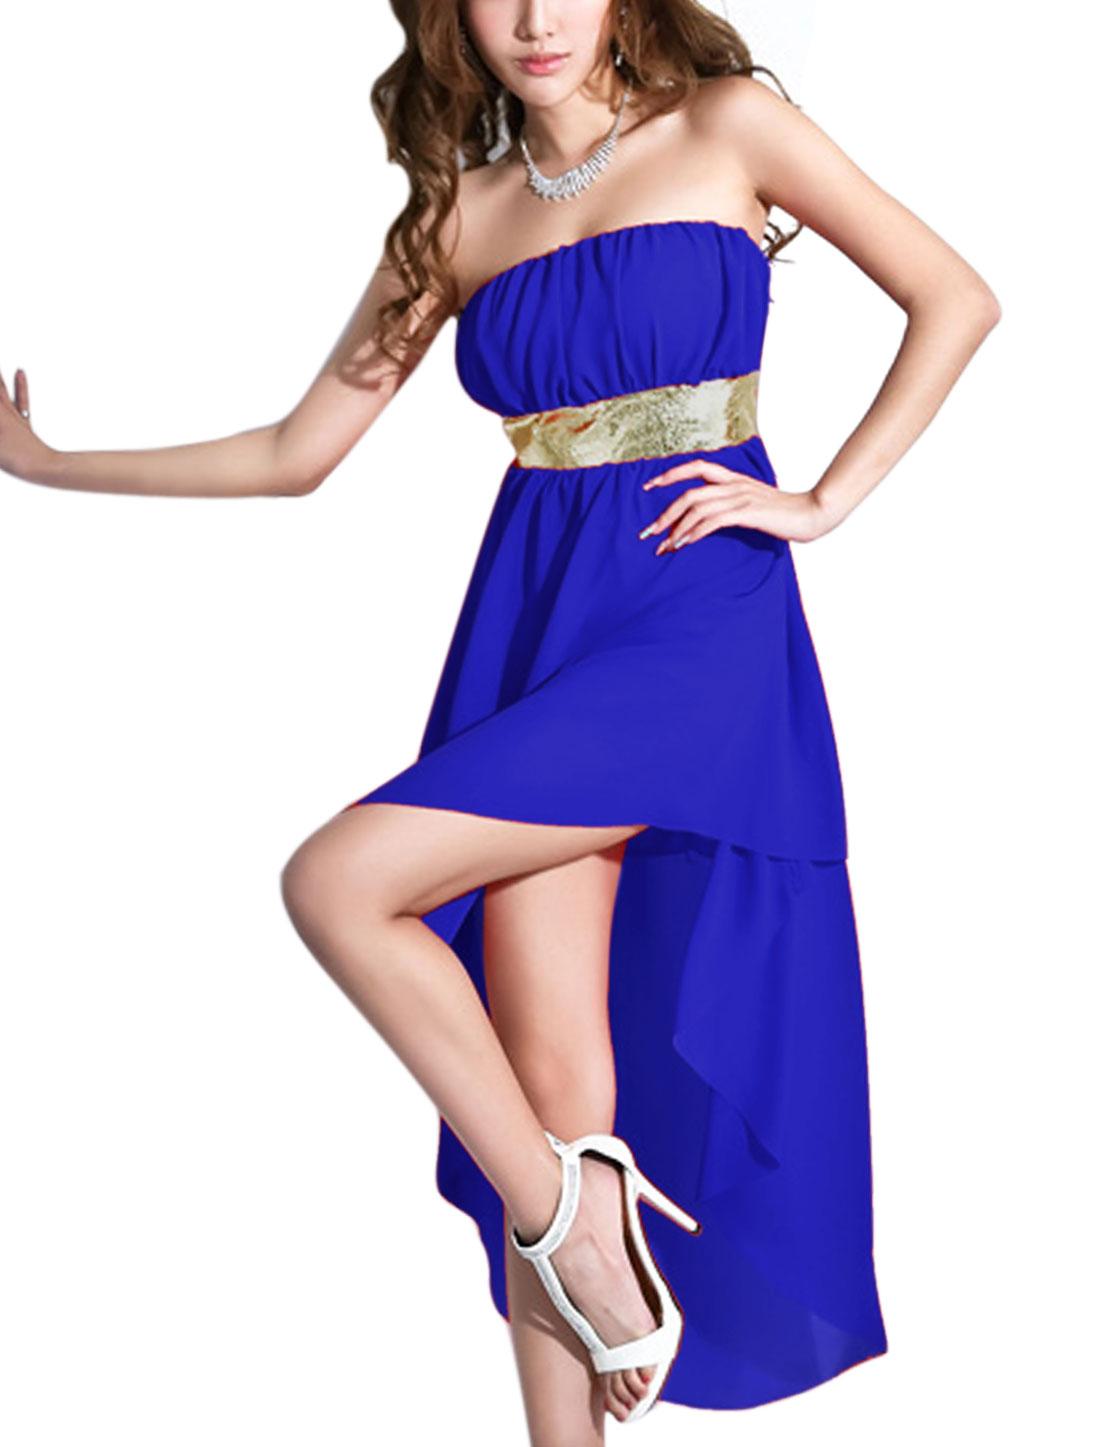 Lady Ruched Detail Full Lined Sexy Chiffon Corset Dress Royal Blue XS